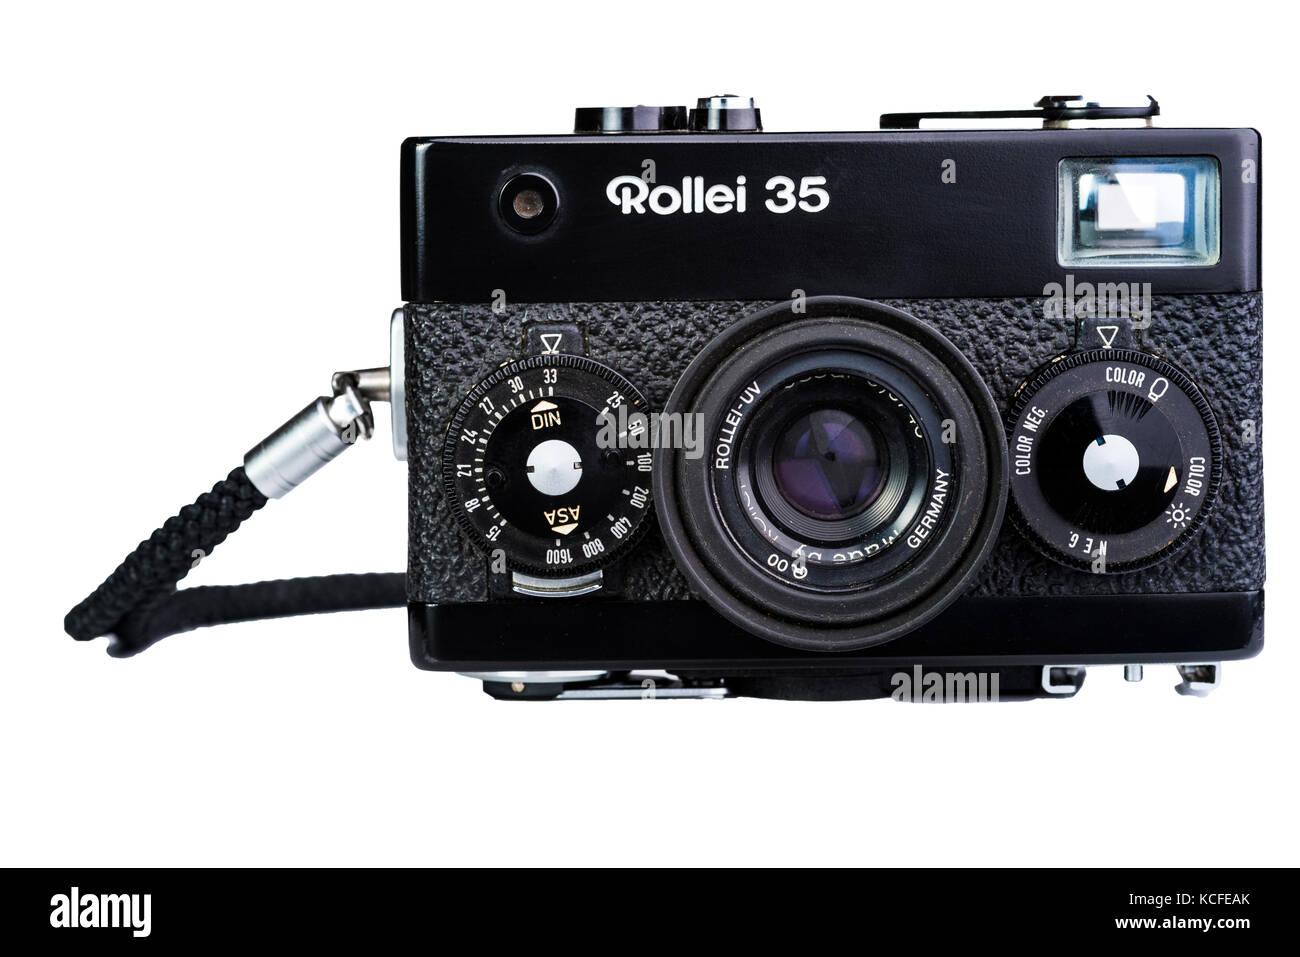 Rollei 35 compact film camera. Vintage old nostalgia. - Stock Image